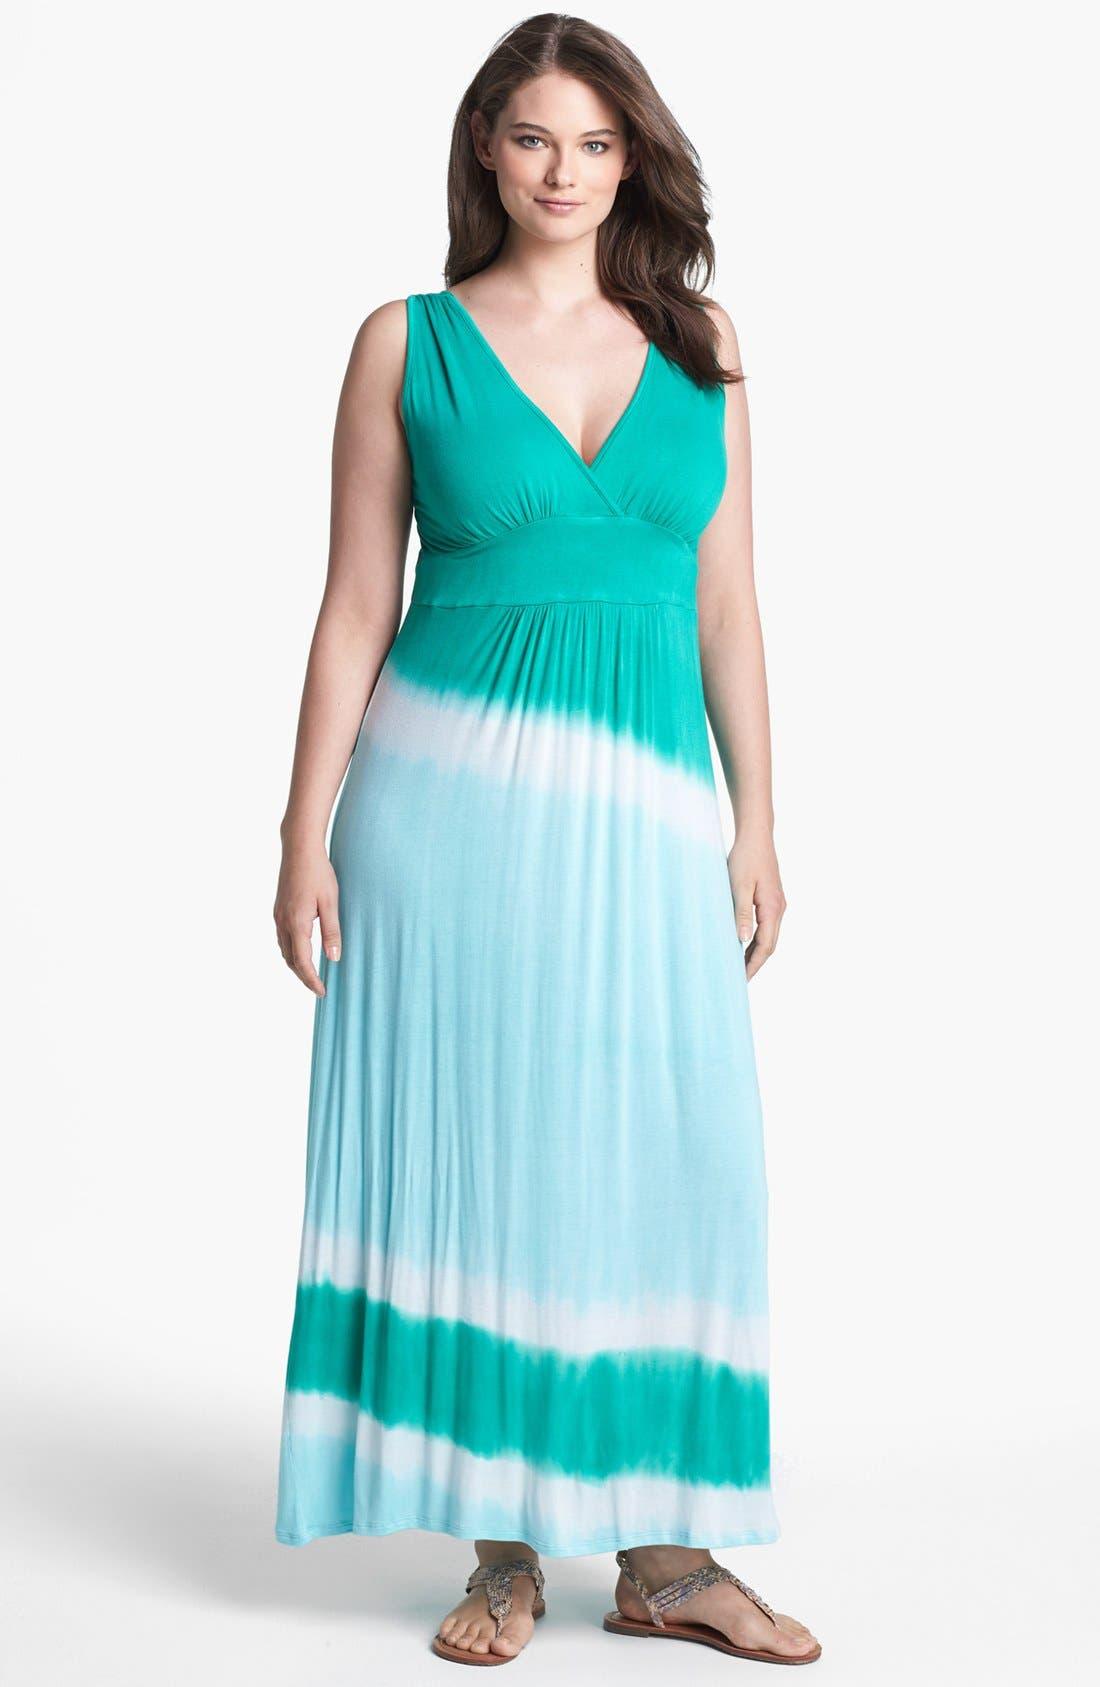 Main Image - Loveappella Tie Dye Jersey Maxi Dress (Plus Size)